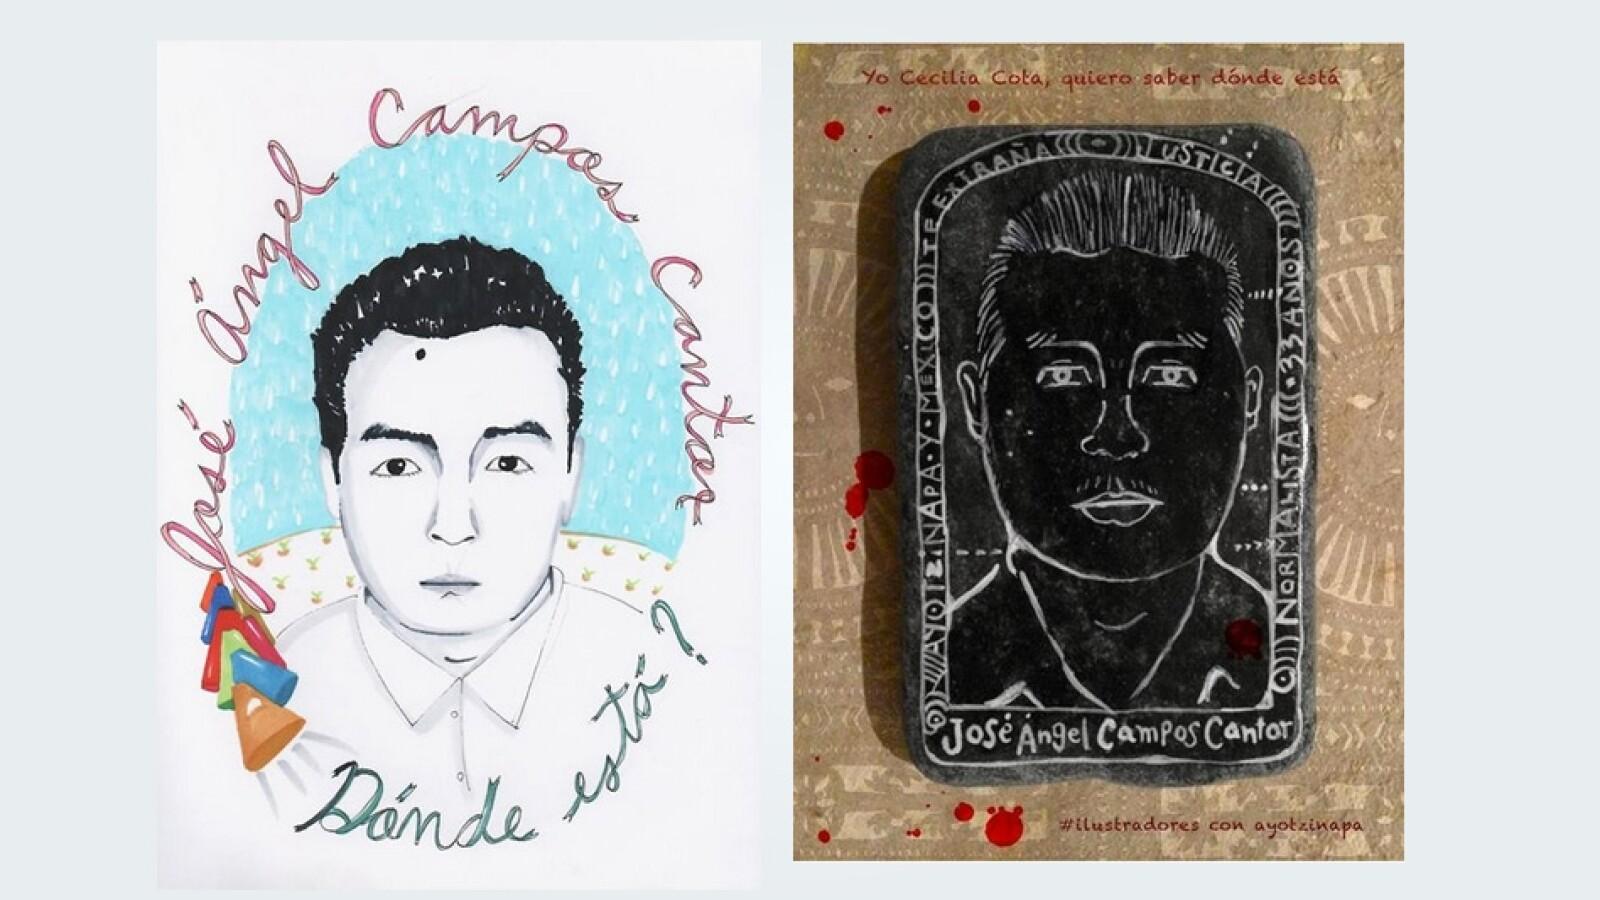 Jose Angel Campos Ayotzinapa